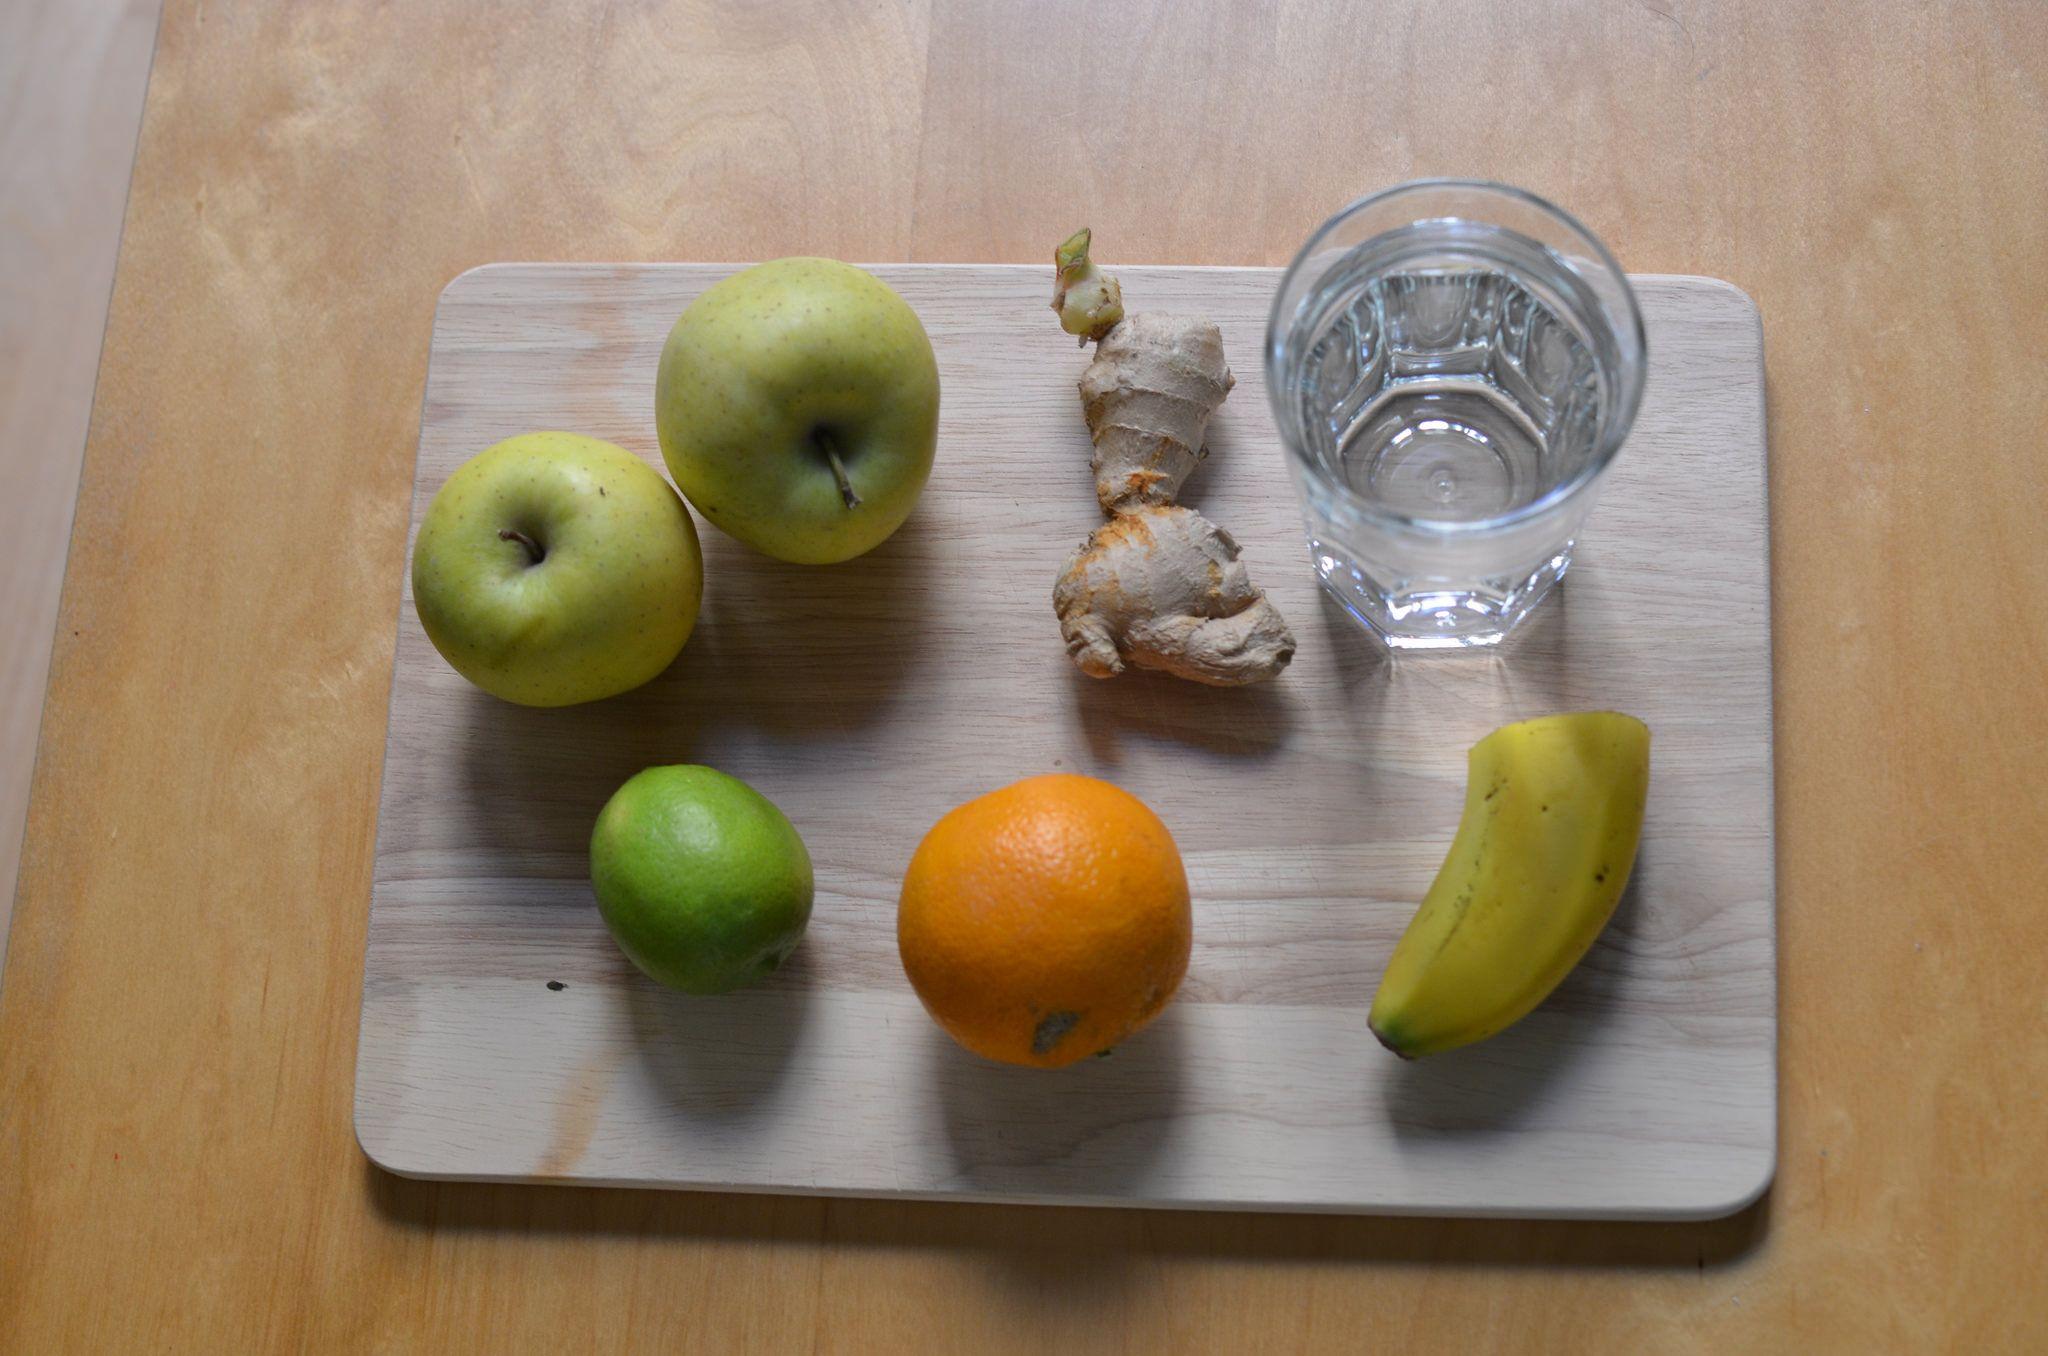 Licuado Detox | Recipes, Nutrition, Food